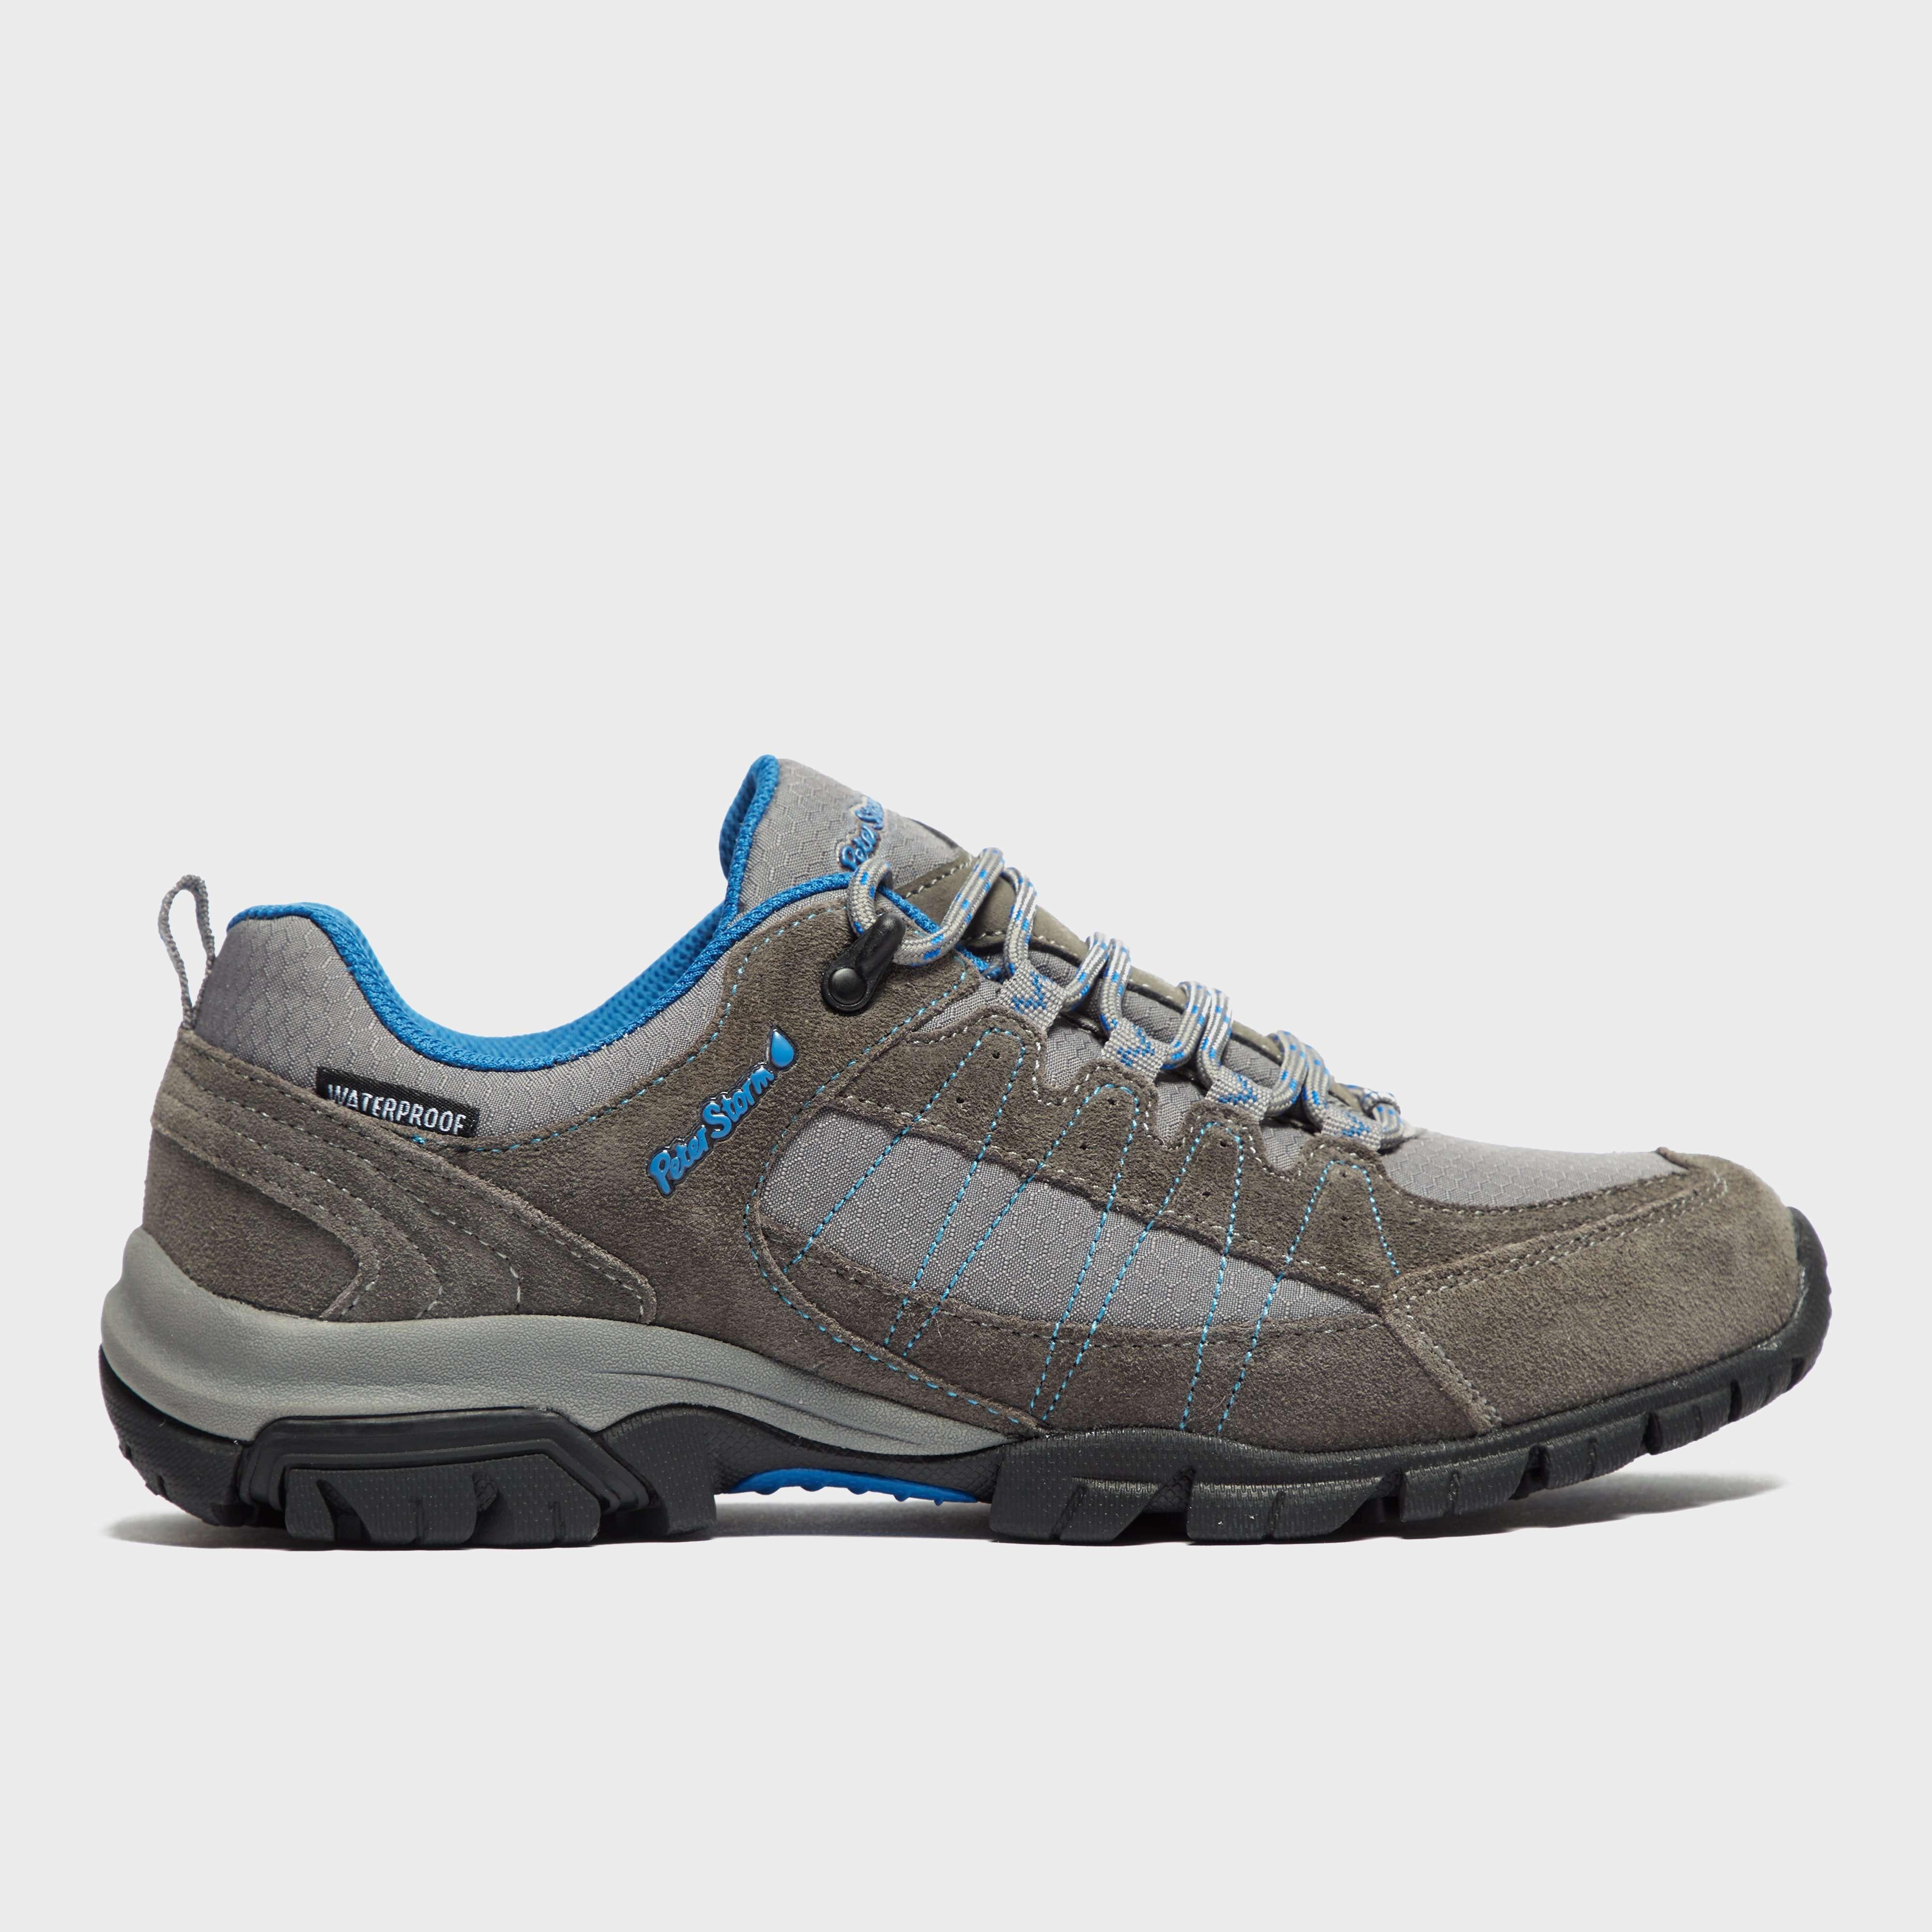 PETER STORM Men's Chiltern Walking Shoe